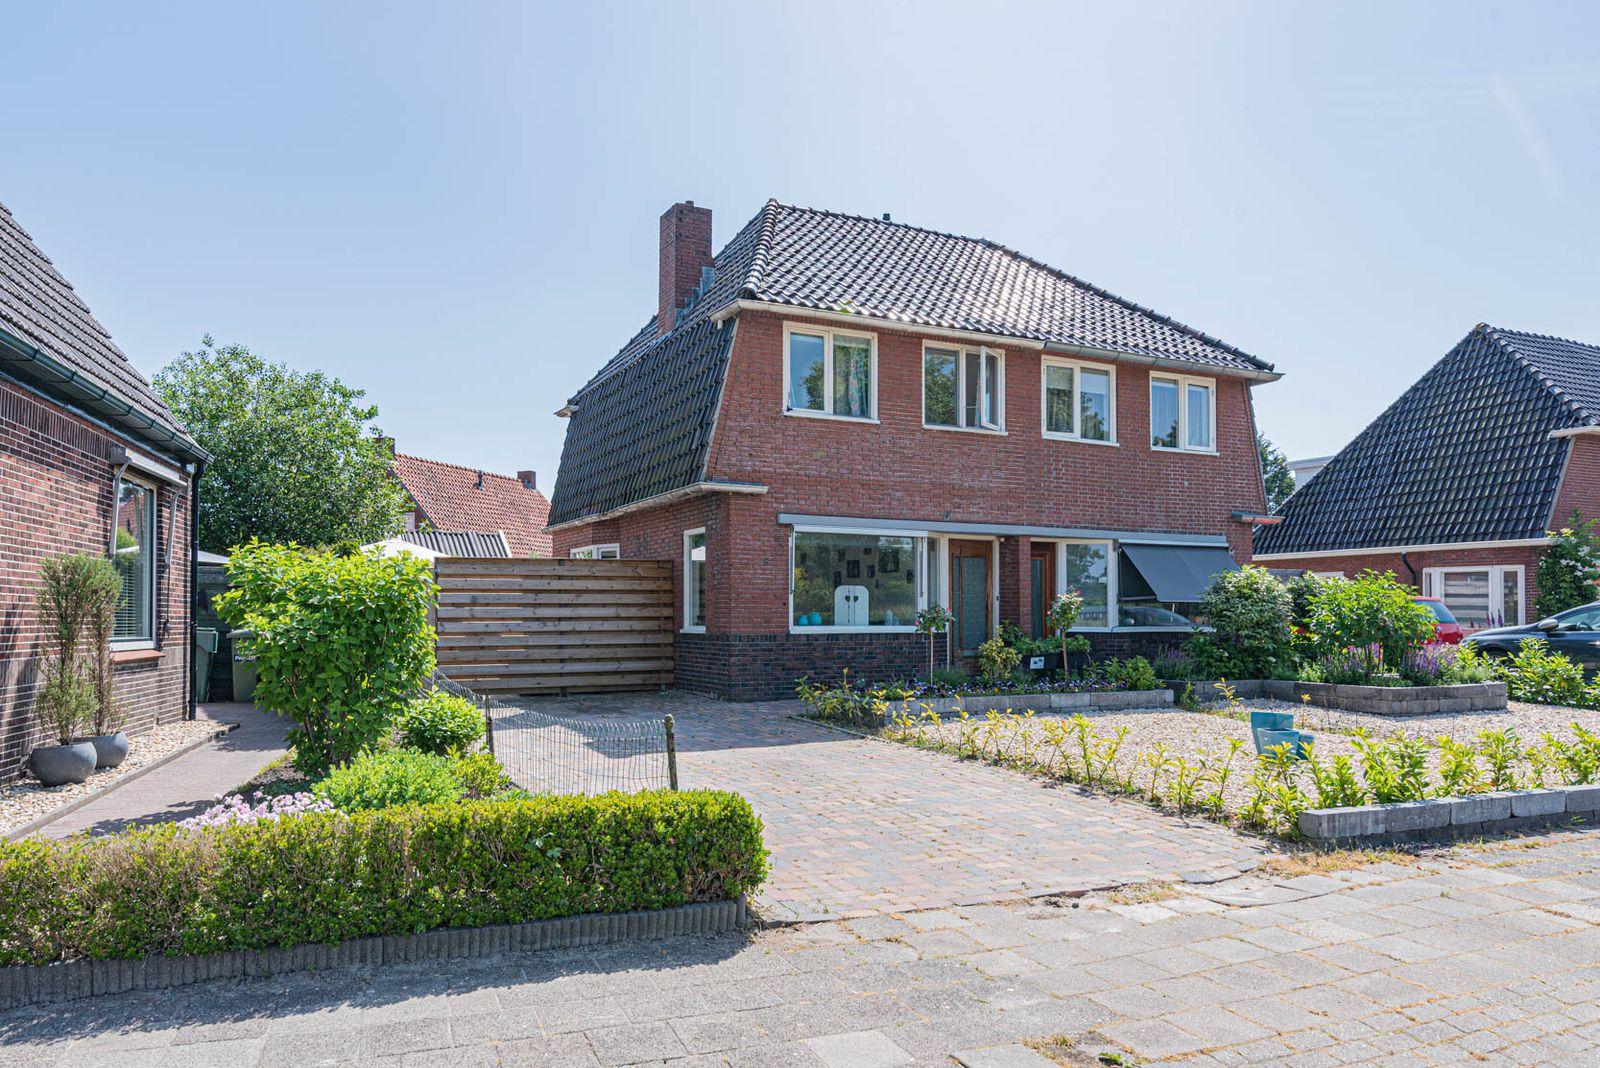 Zuiderveen 8, Winschoten